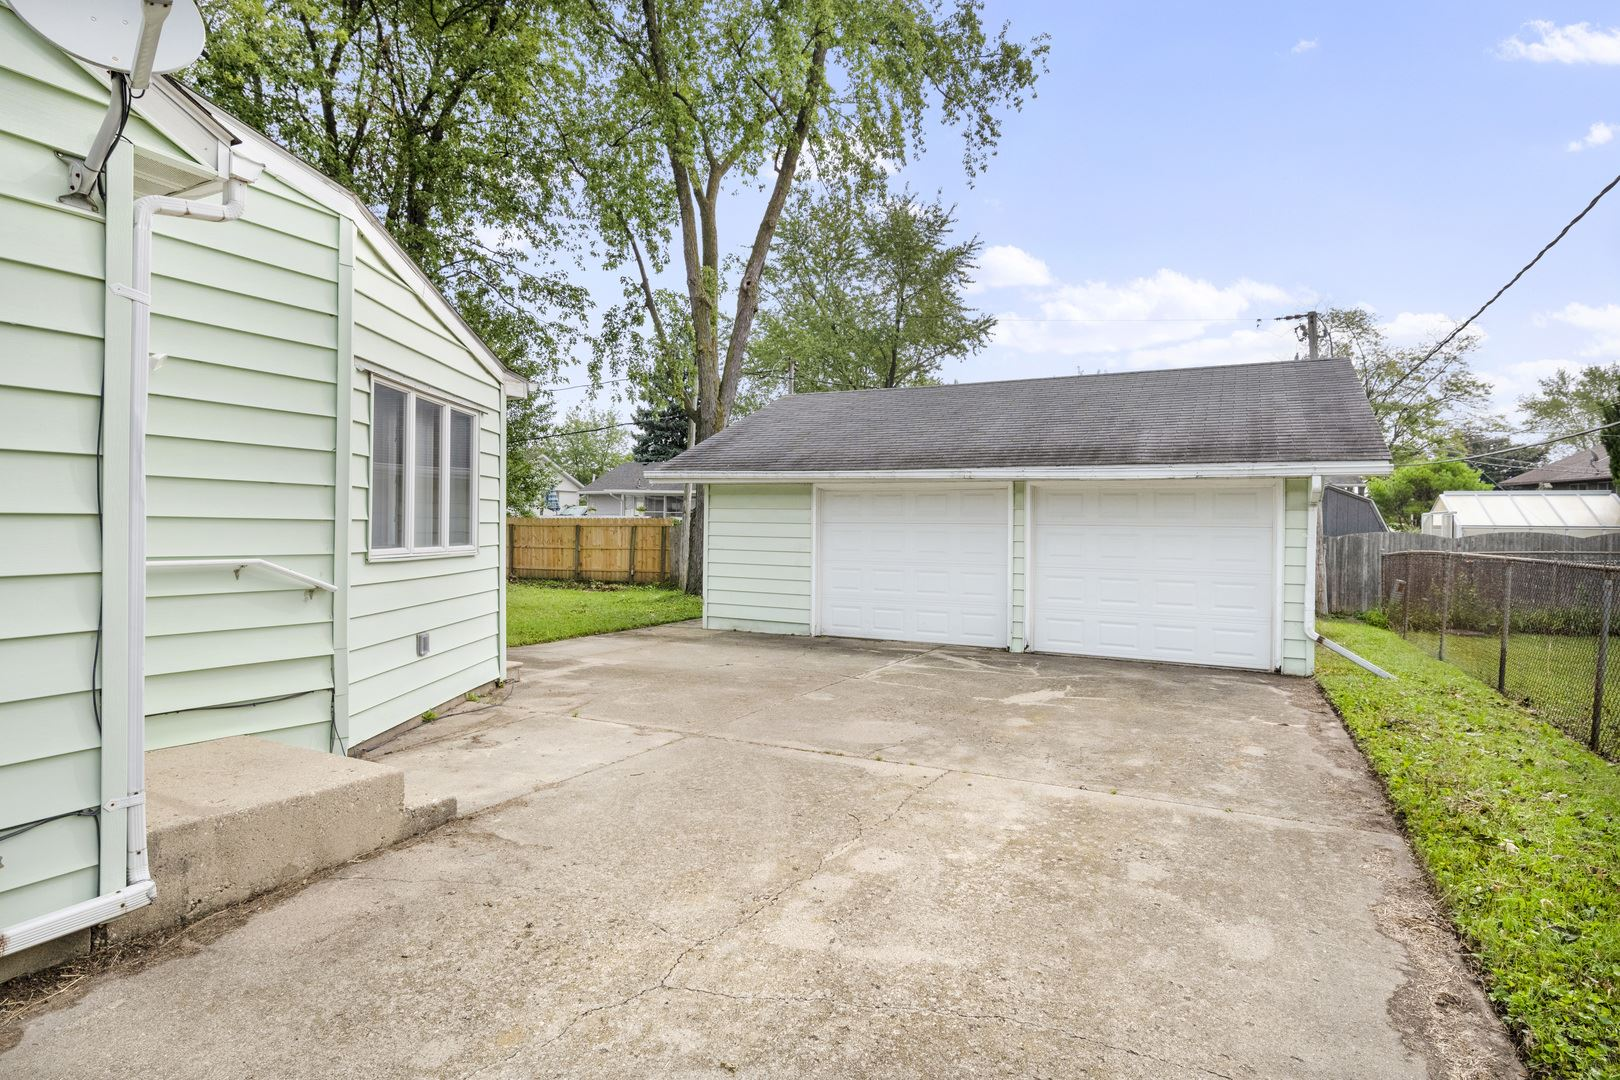 Photo of 254 Putter Court, Joliet, IL 60435 (MLS # 10856540)